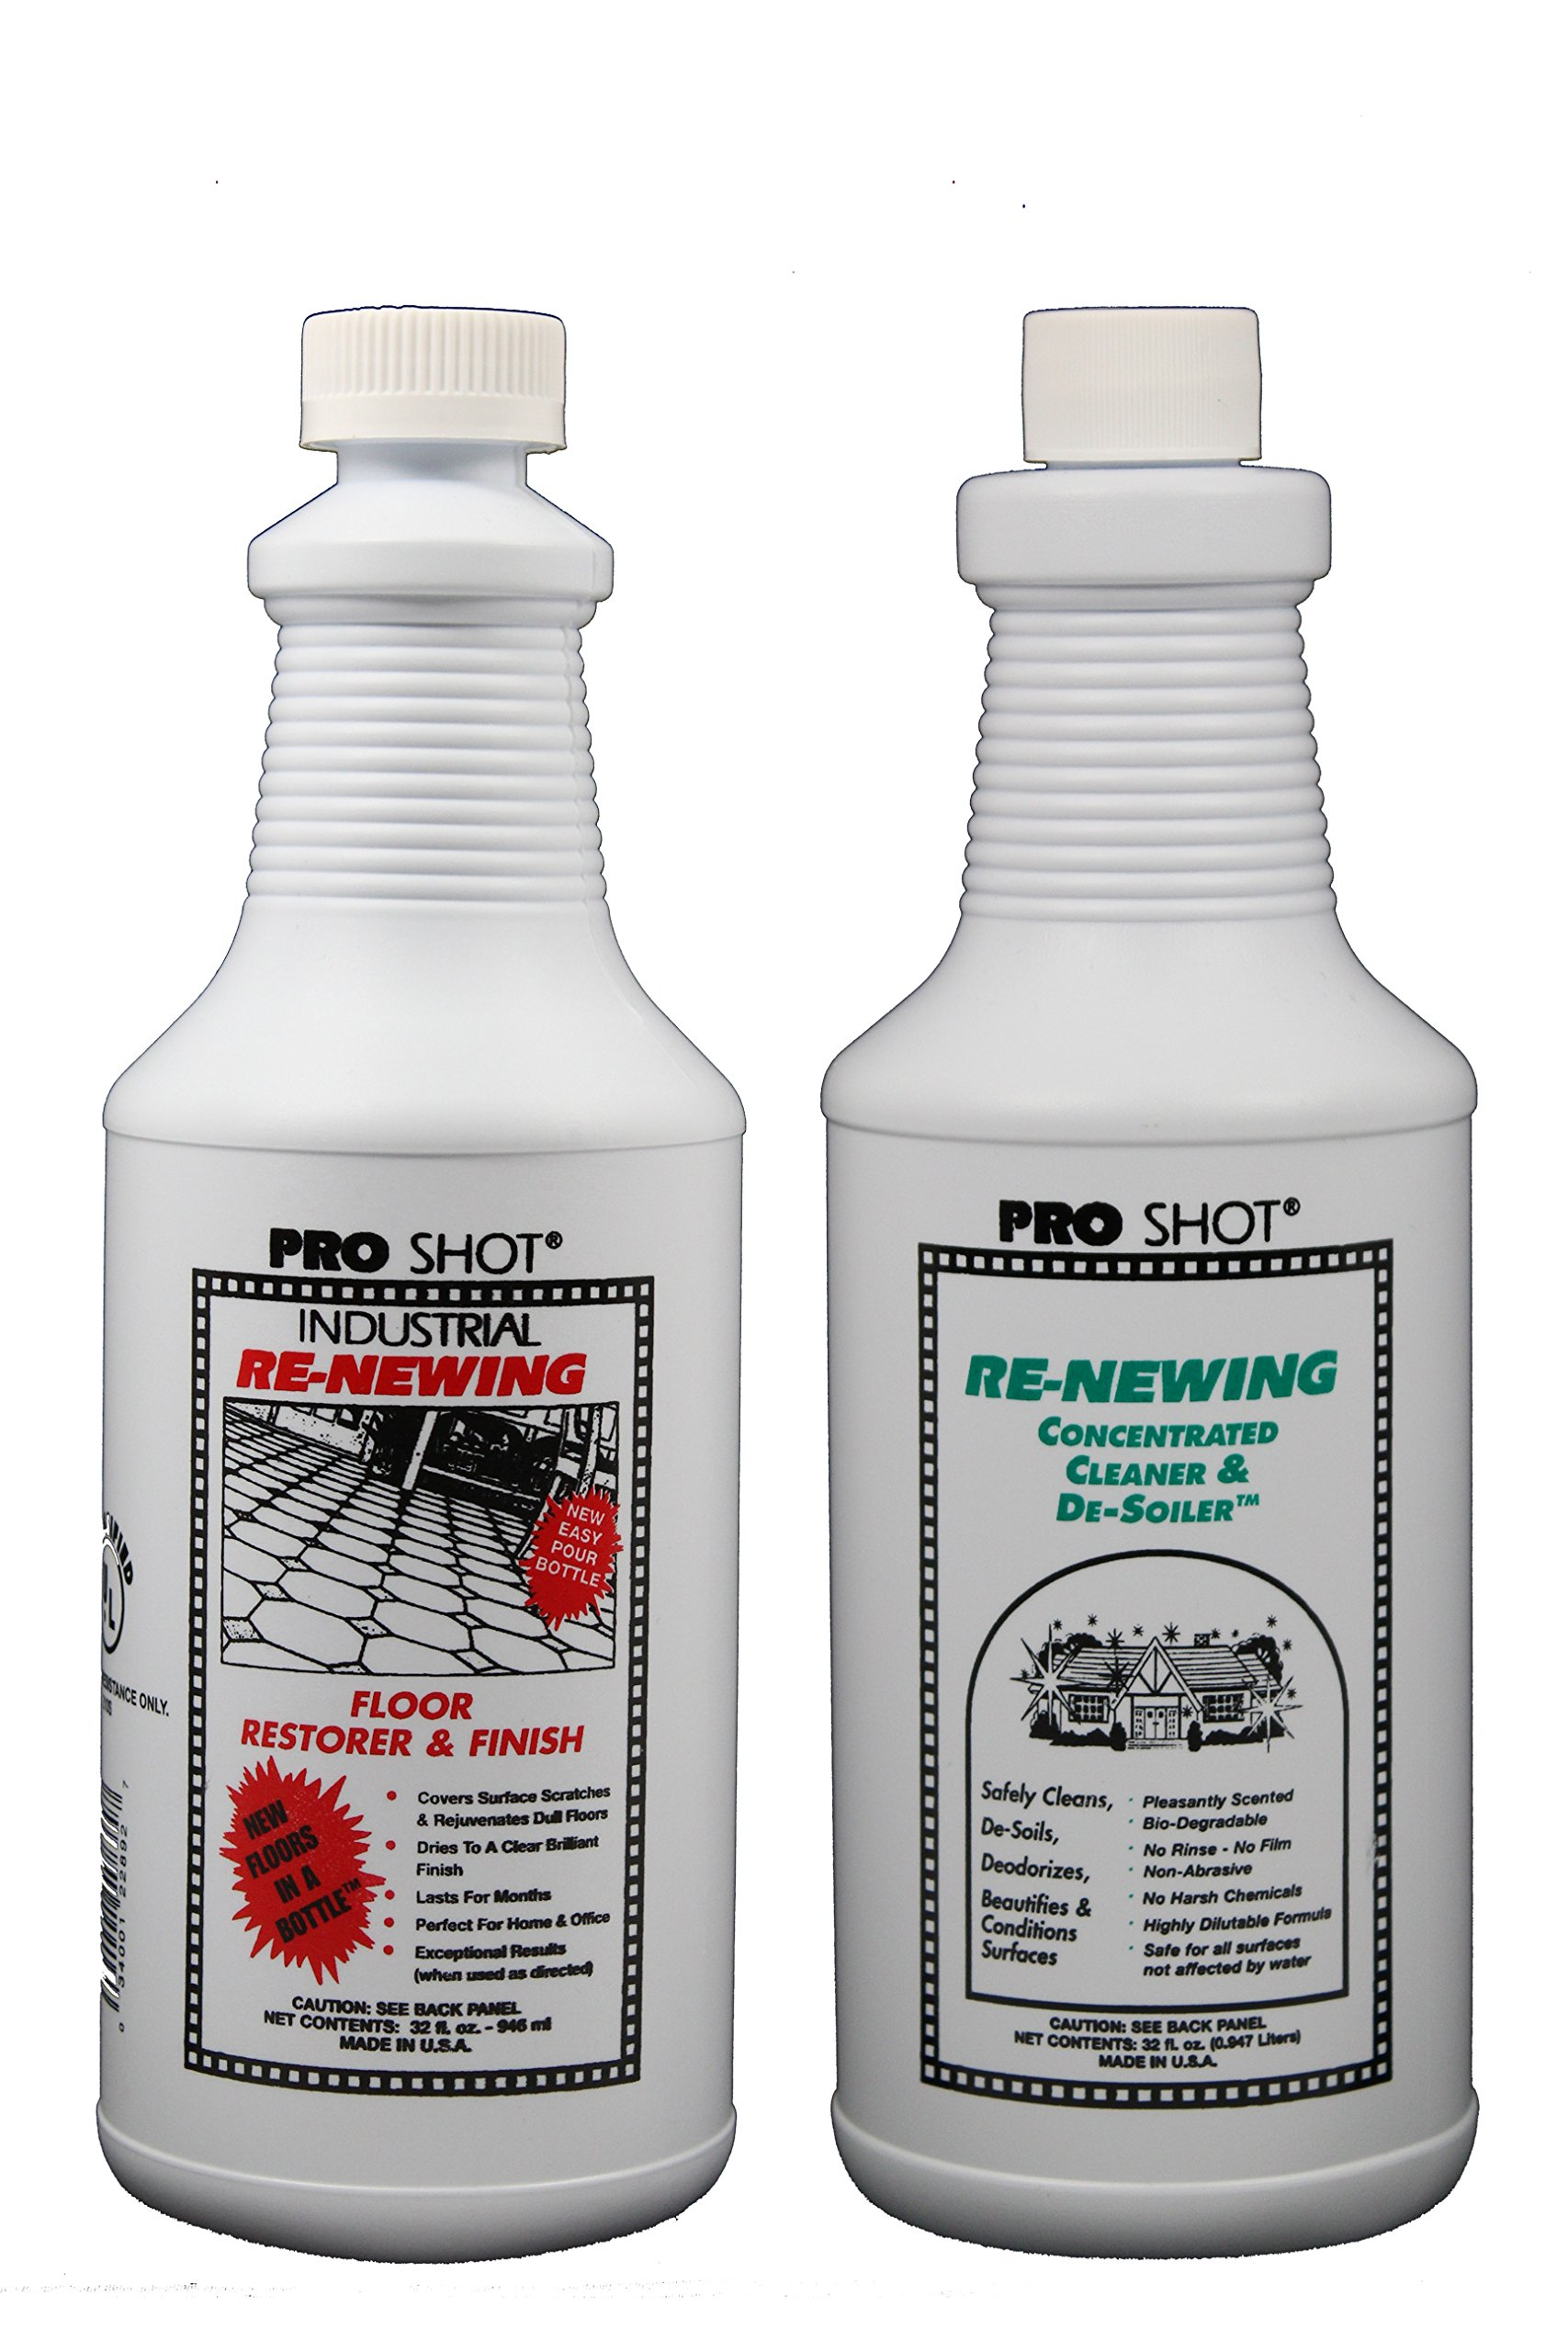 PRO SHOT Industrial Re-Newing Floor Restorer & Finish 32 oz & PRO SHOT Re-Newing Concentrated Cleaner & De-Soiler 32 oz Kit